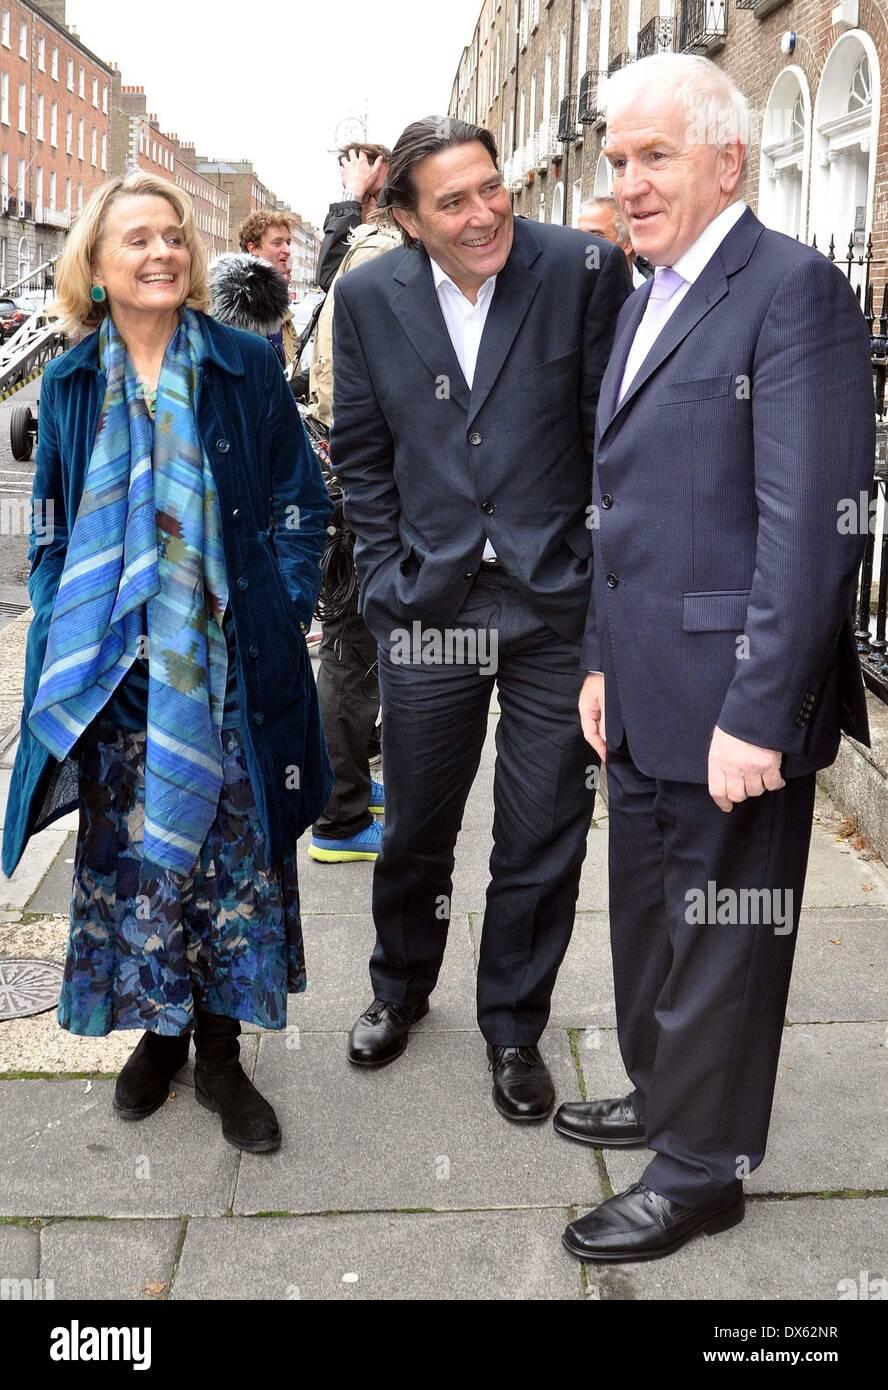 "Ciaran Hinds-set Sinead Cusack mit Minister Jimmy Deenihan den Film ""The Sea"" in Dublin Dublin, Irland - 26.10.12 wo: Stockfoto"